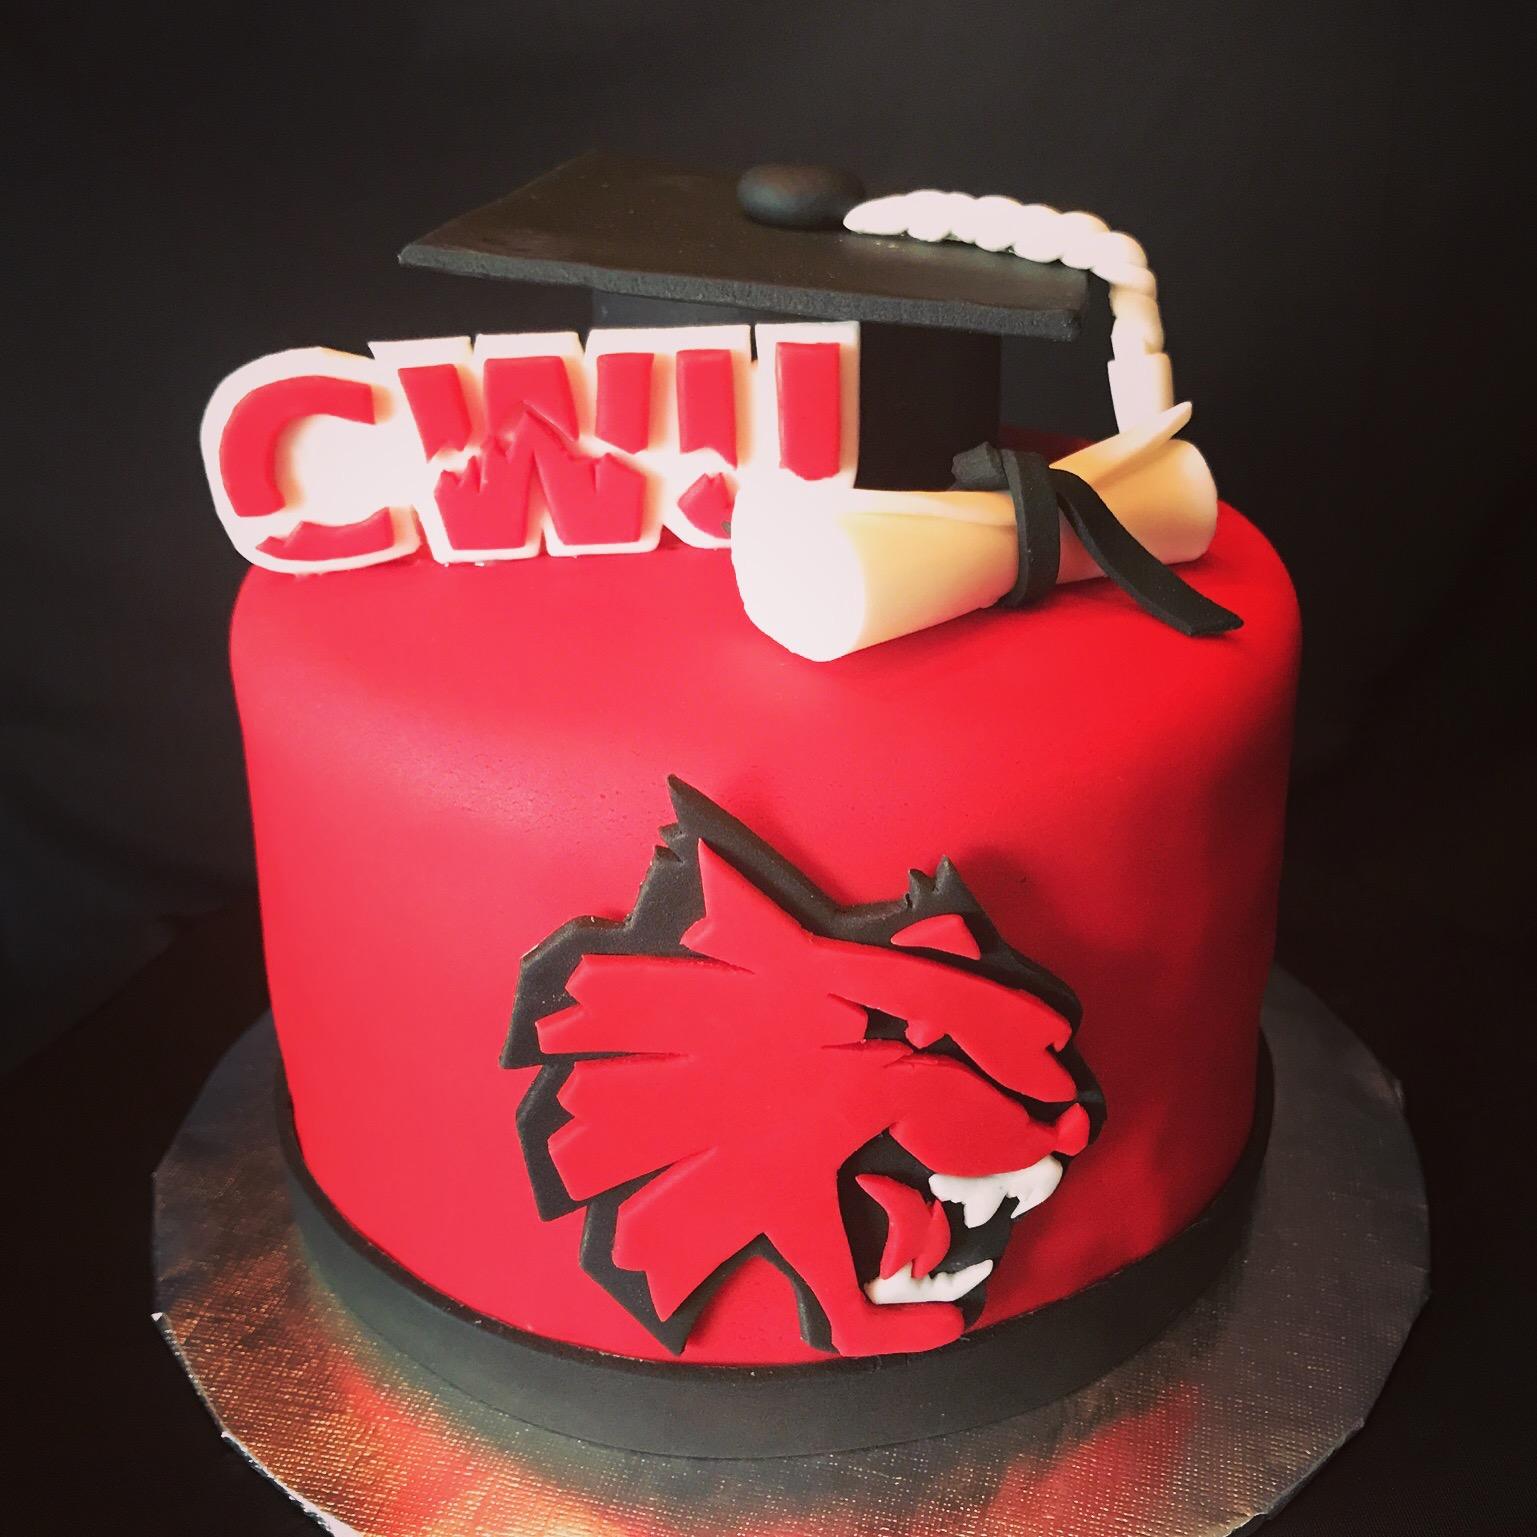 CWU cake